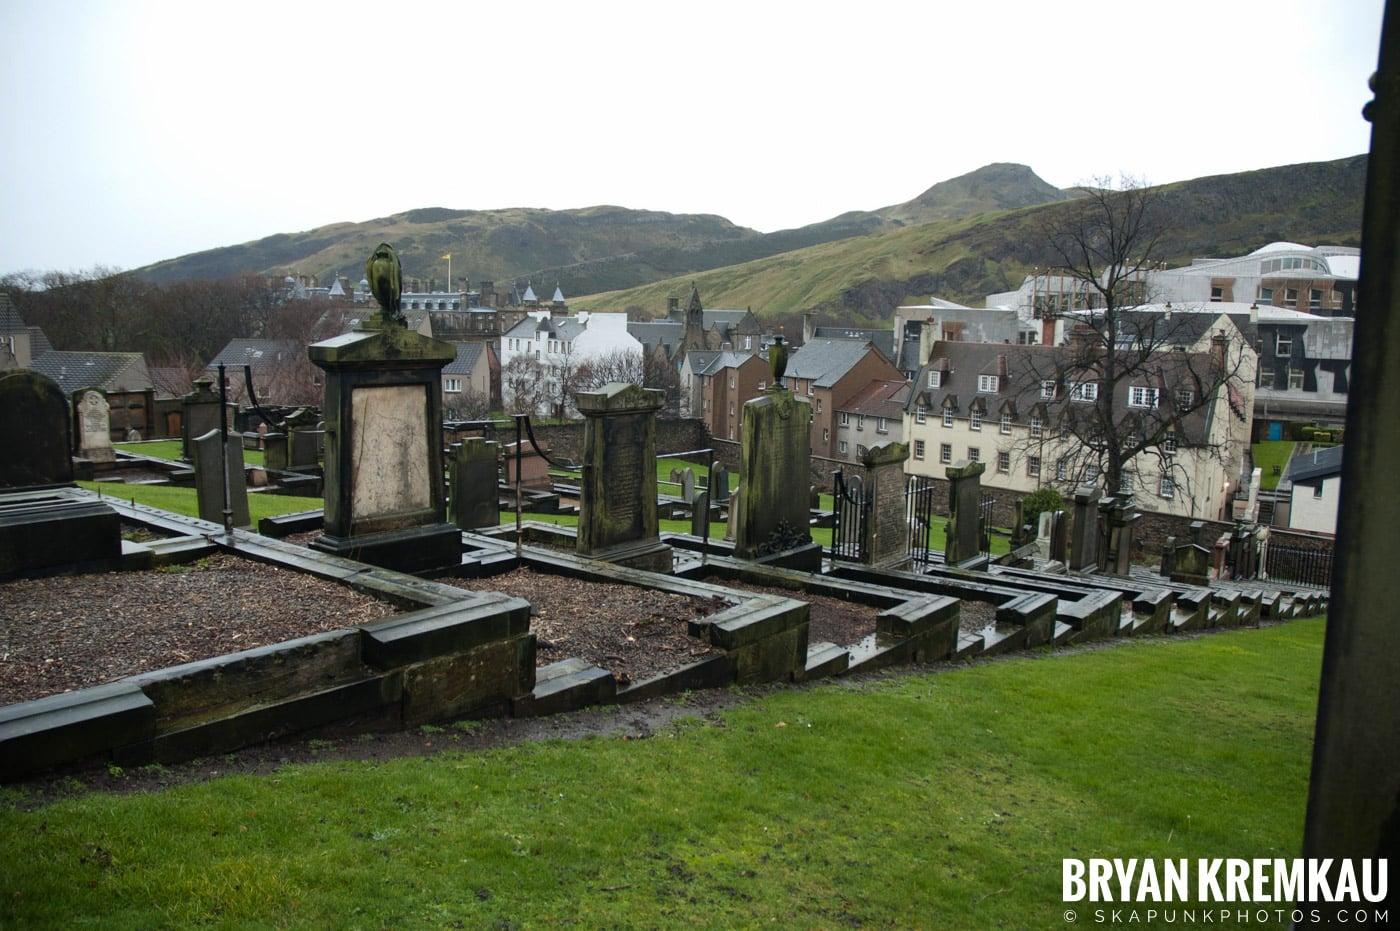 Edinburgh, Scotland - Day 2 - 12.13.06 (40)